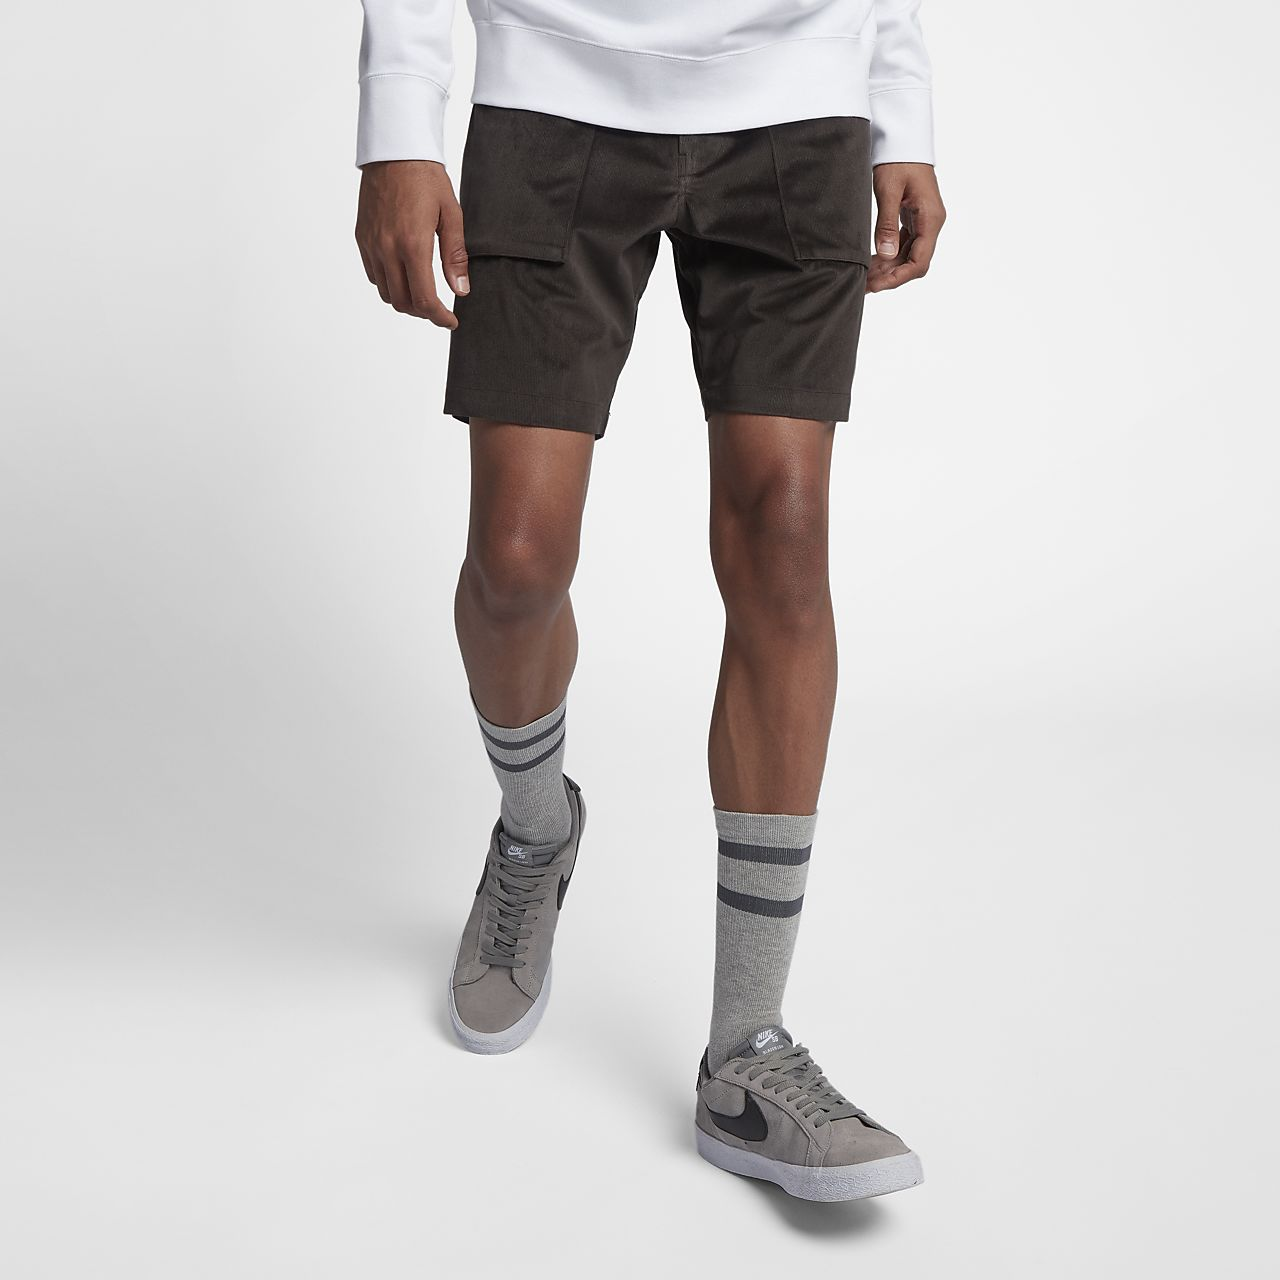 Flex Fit Men's Sb Dri Lu Shorts Nike qt6UfSwxHw